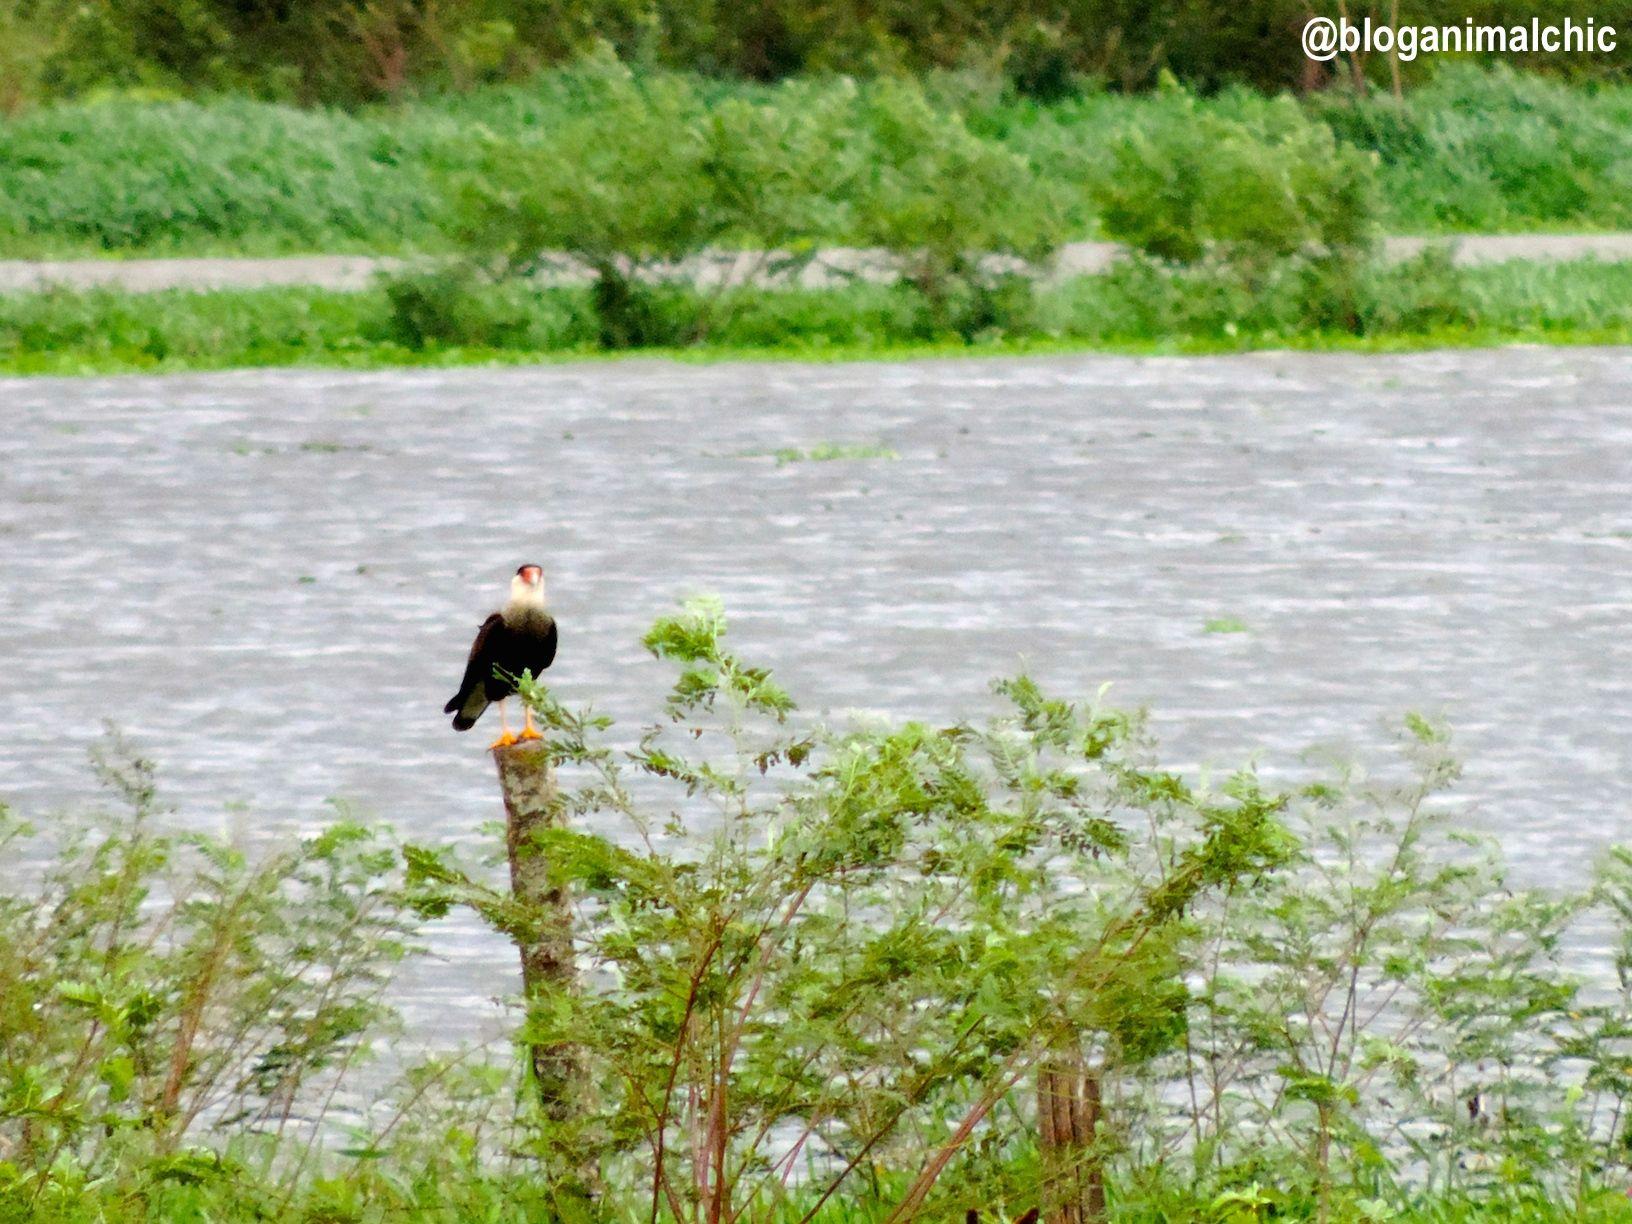 Caracará (Caracara plancus) fotografado no Tanquã, o mini-pantanal de Piracicaba/SP, em Março/14.